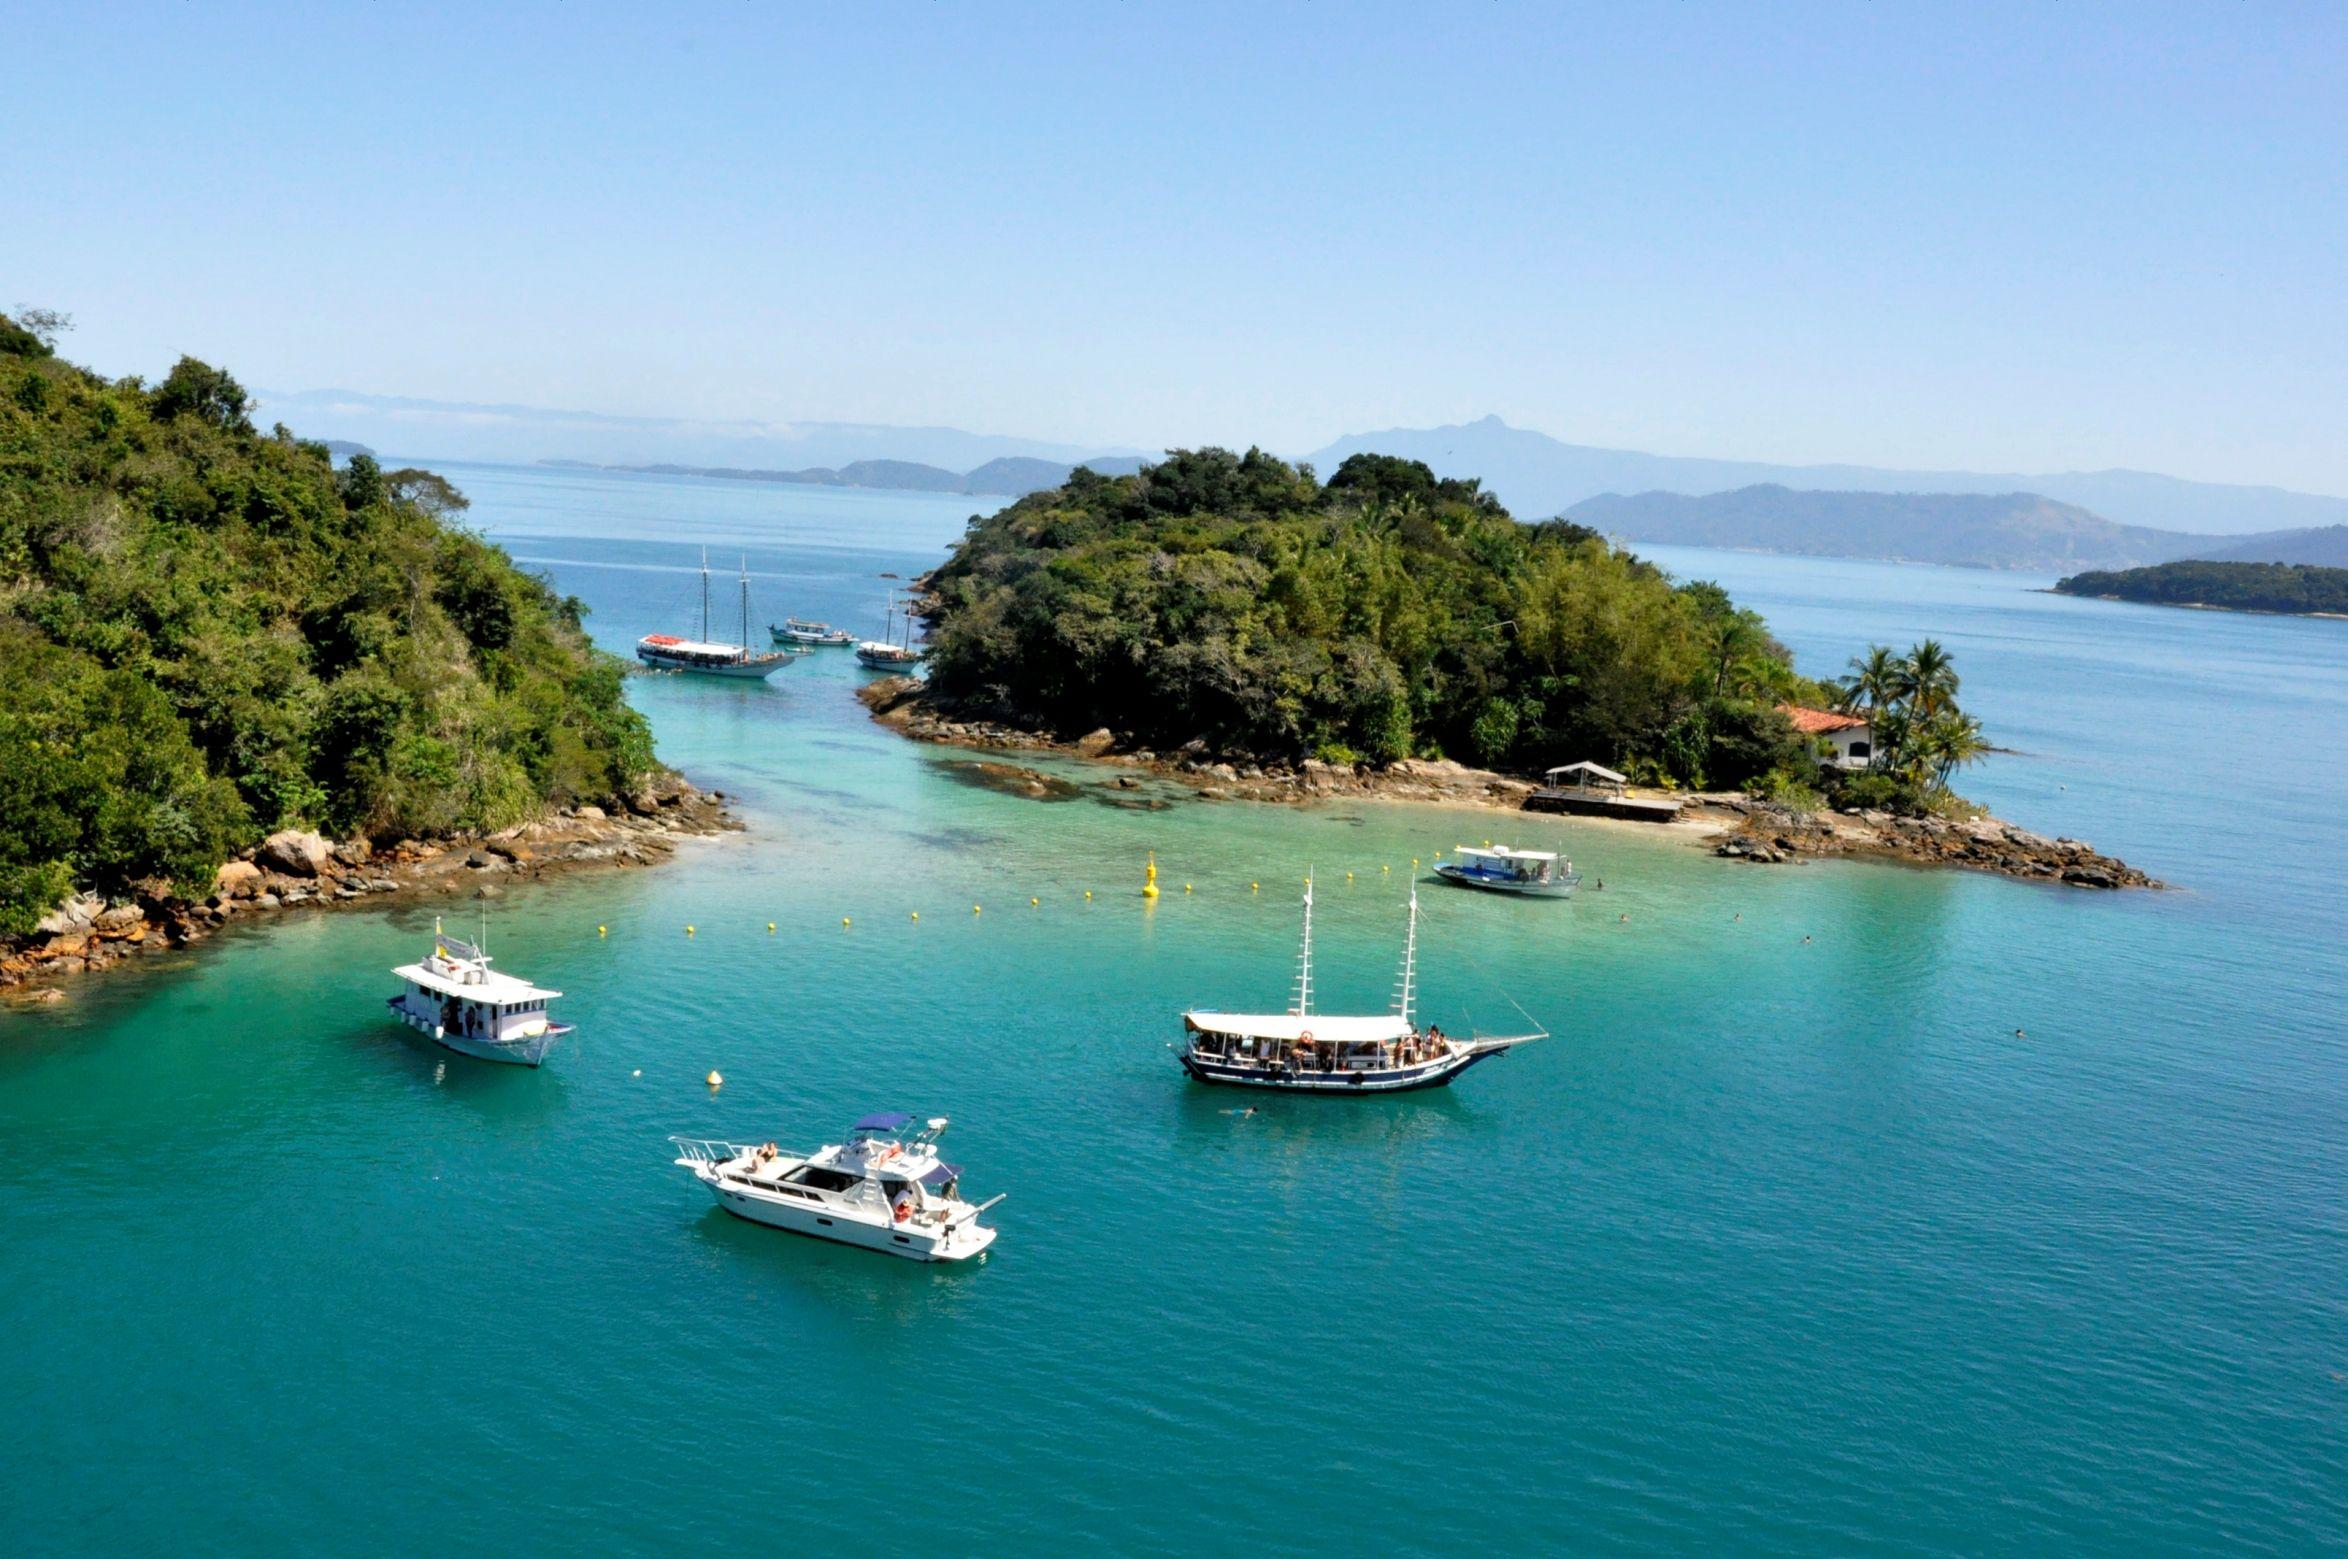 lagoa-azul-ilha-grande-angra-dos-reis-3.jpg